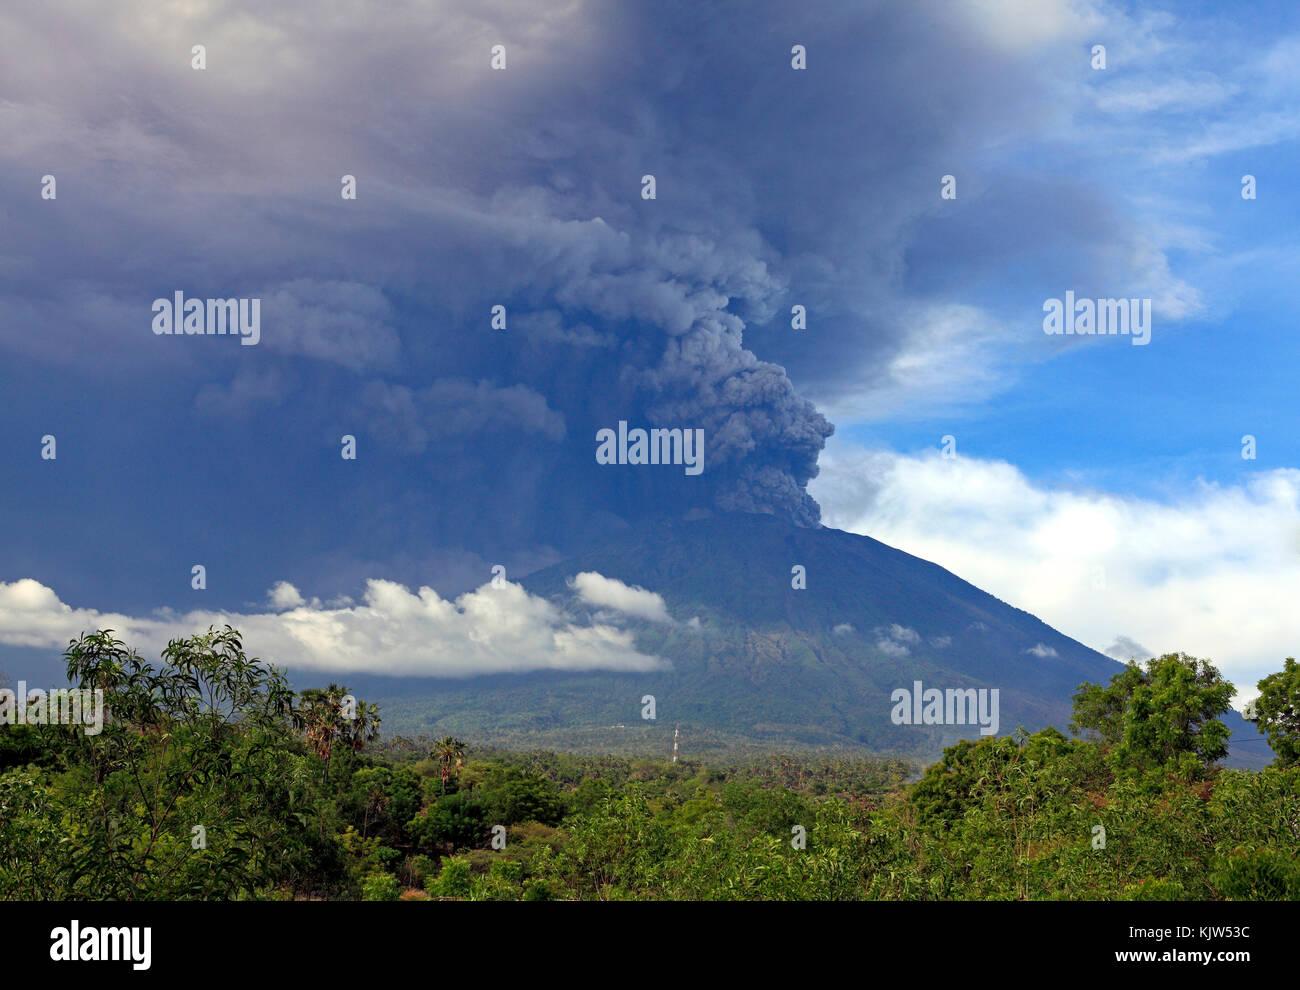 mt-agung-volcano-eruption-morning-of-26-